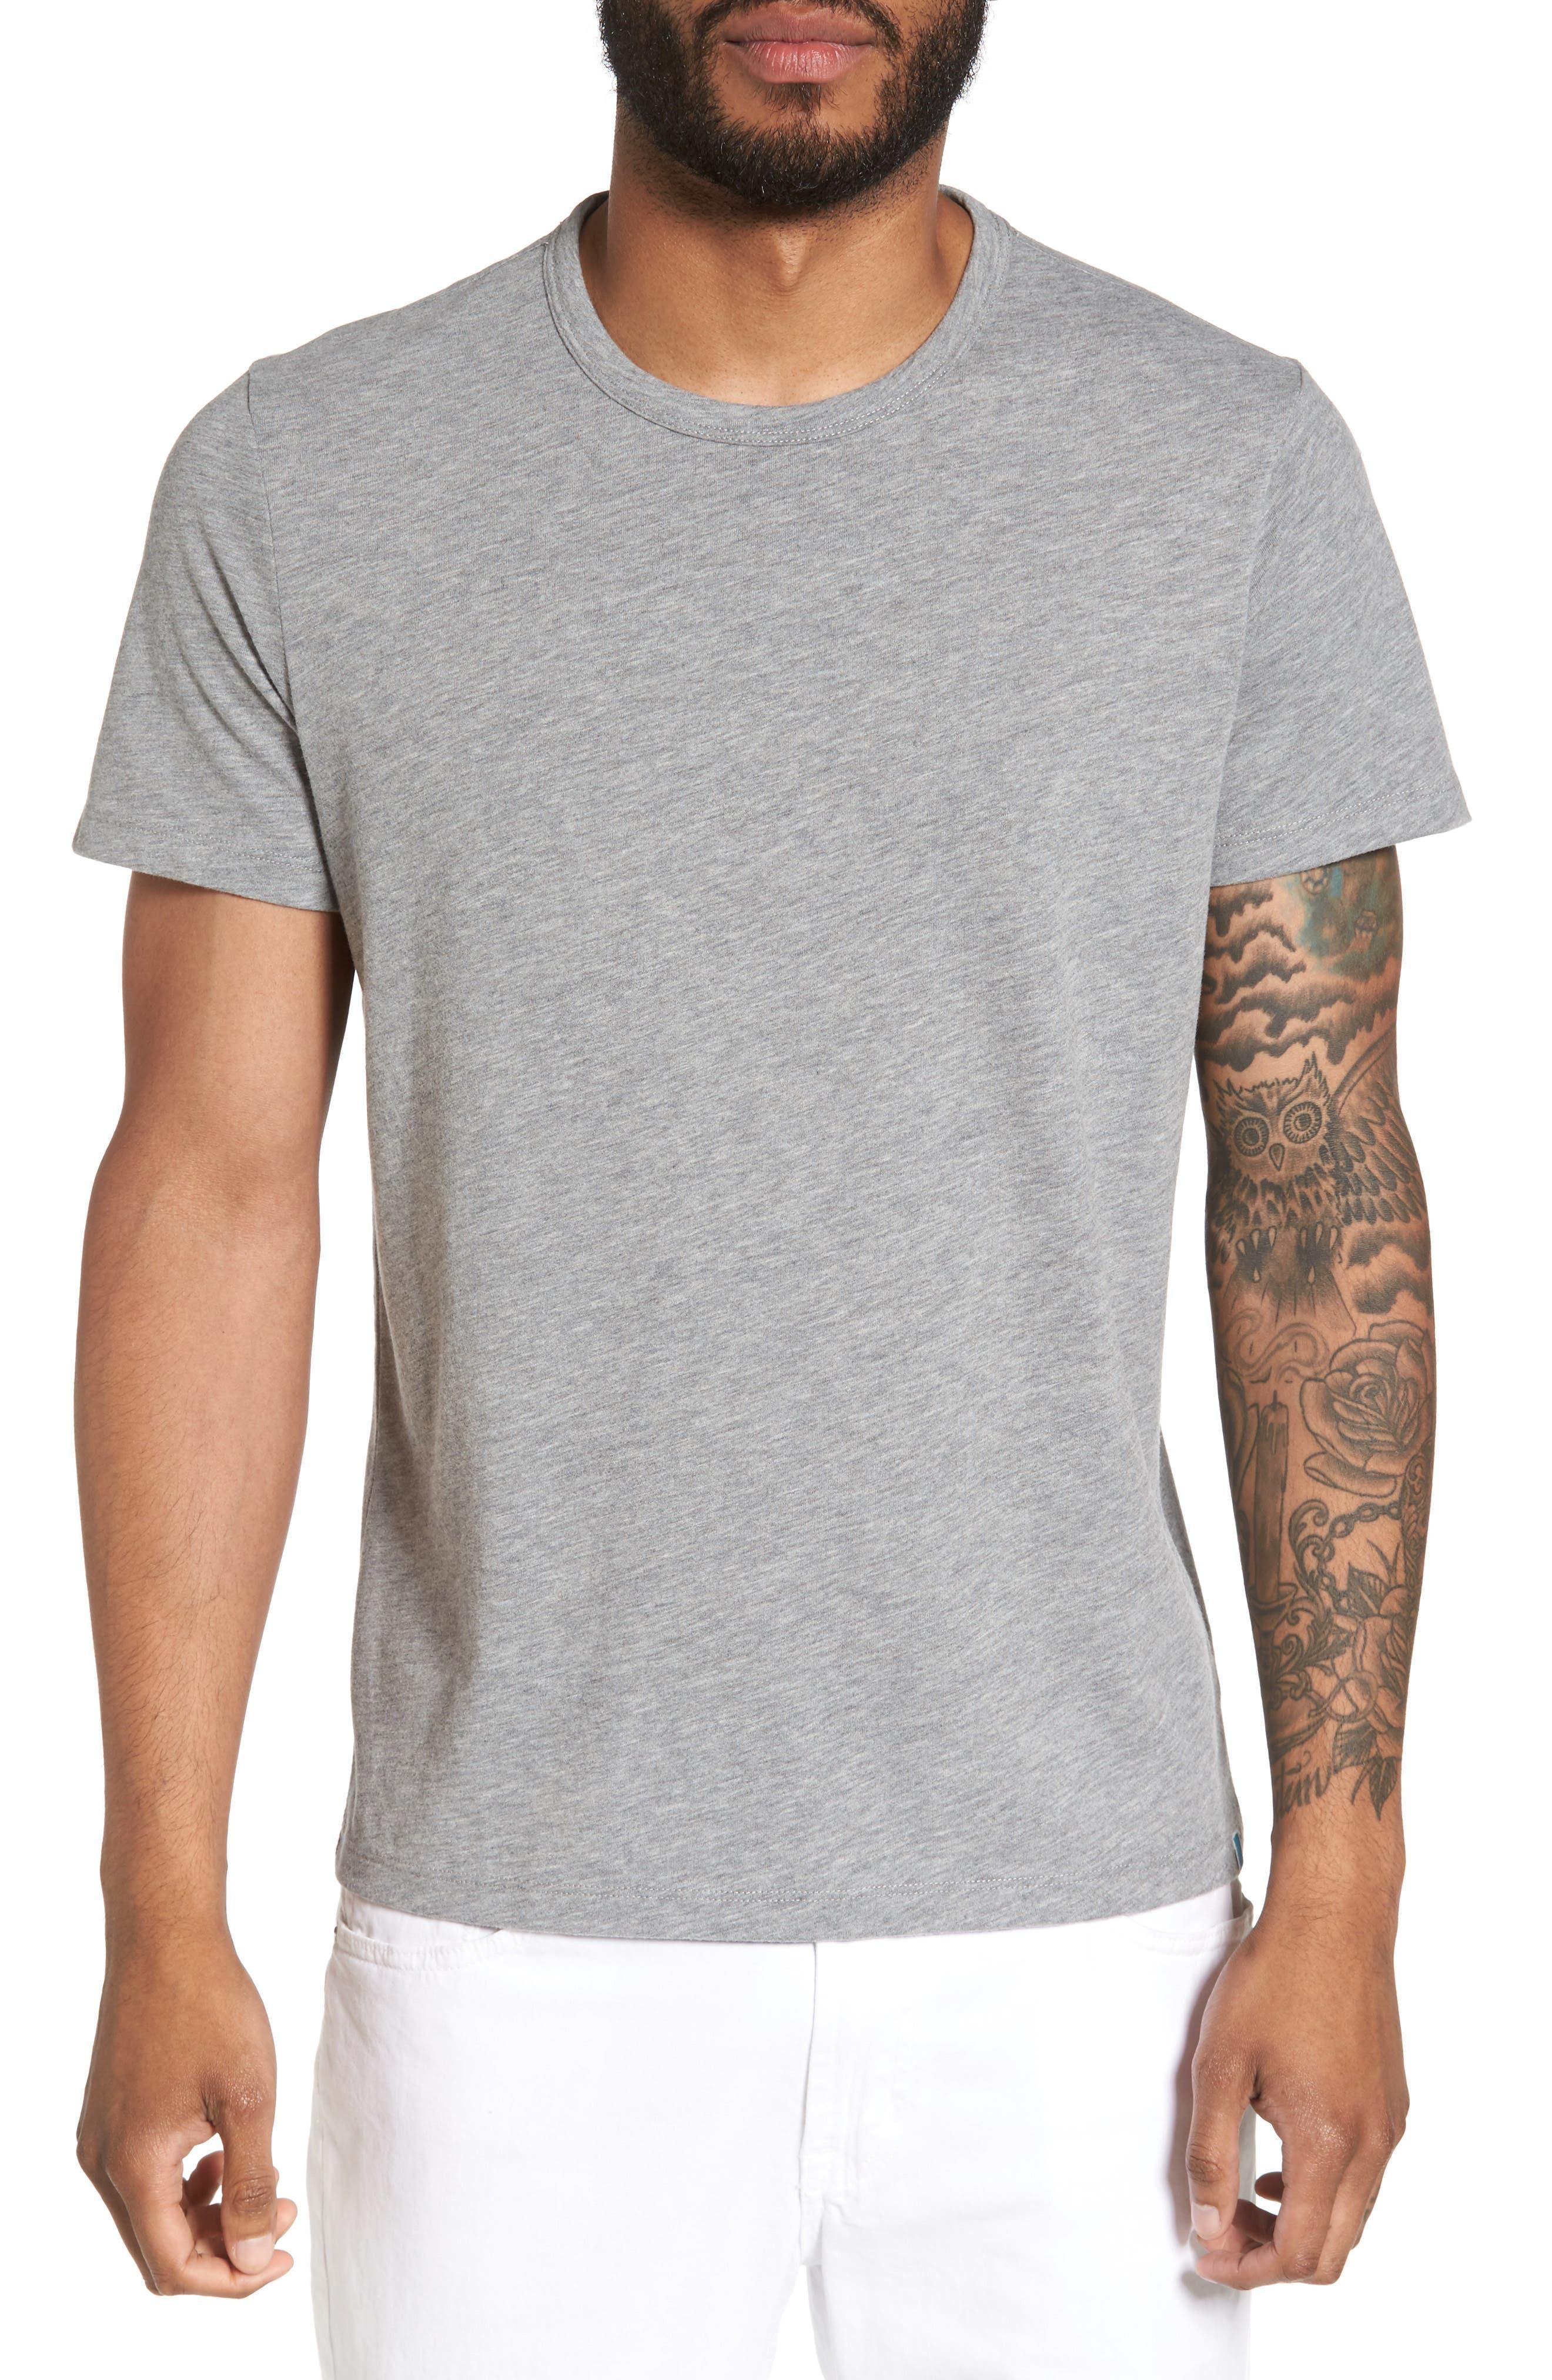 Jason Scott Thomas Crewneck T-Shirt